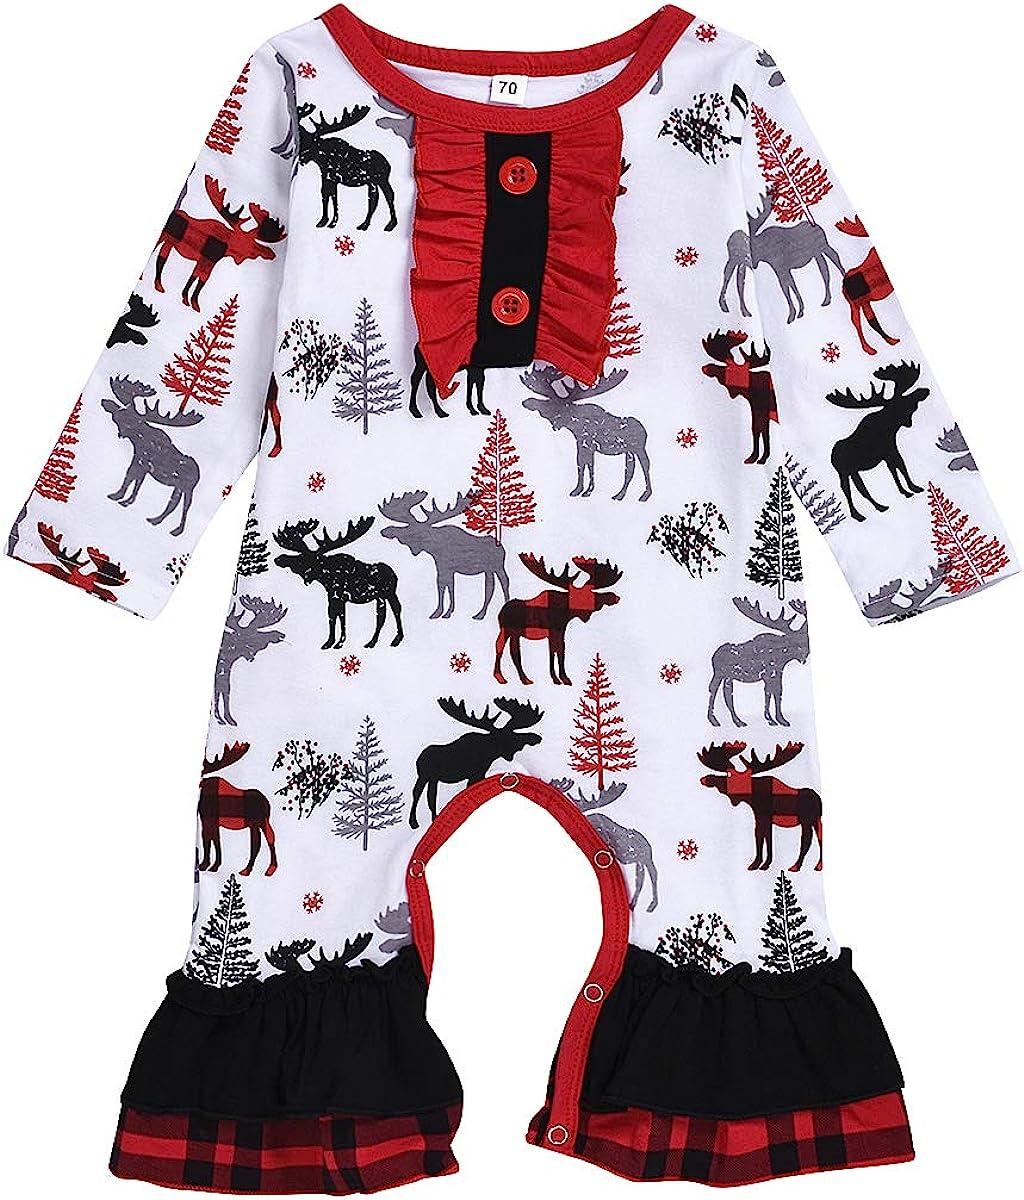 Infant Baby Girl Boy Floral Long Sleeve Romper Bodysuit Jumpsuit Clothes Outfit